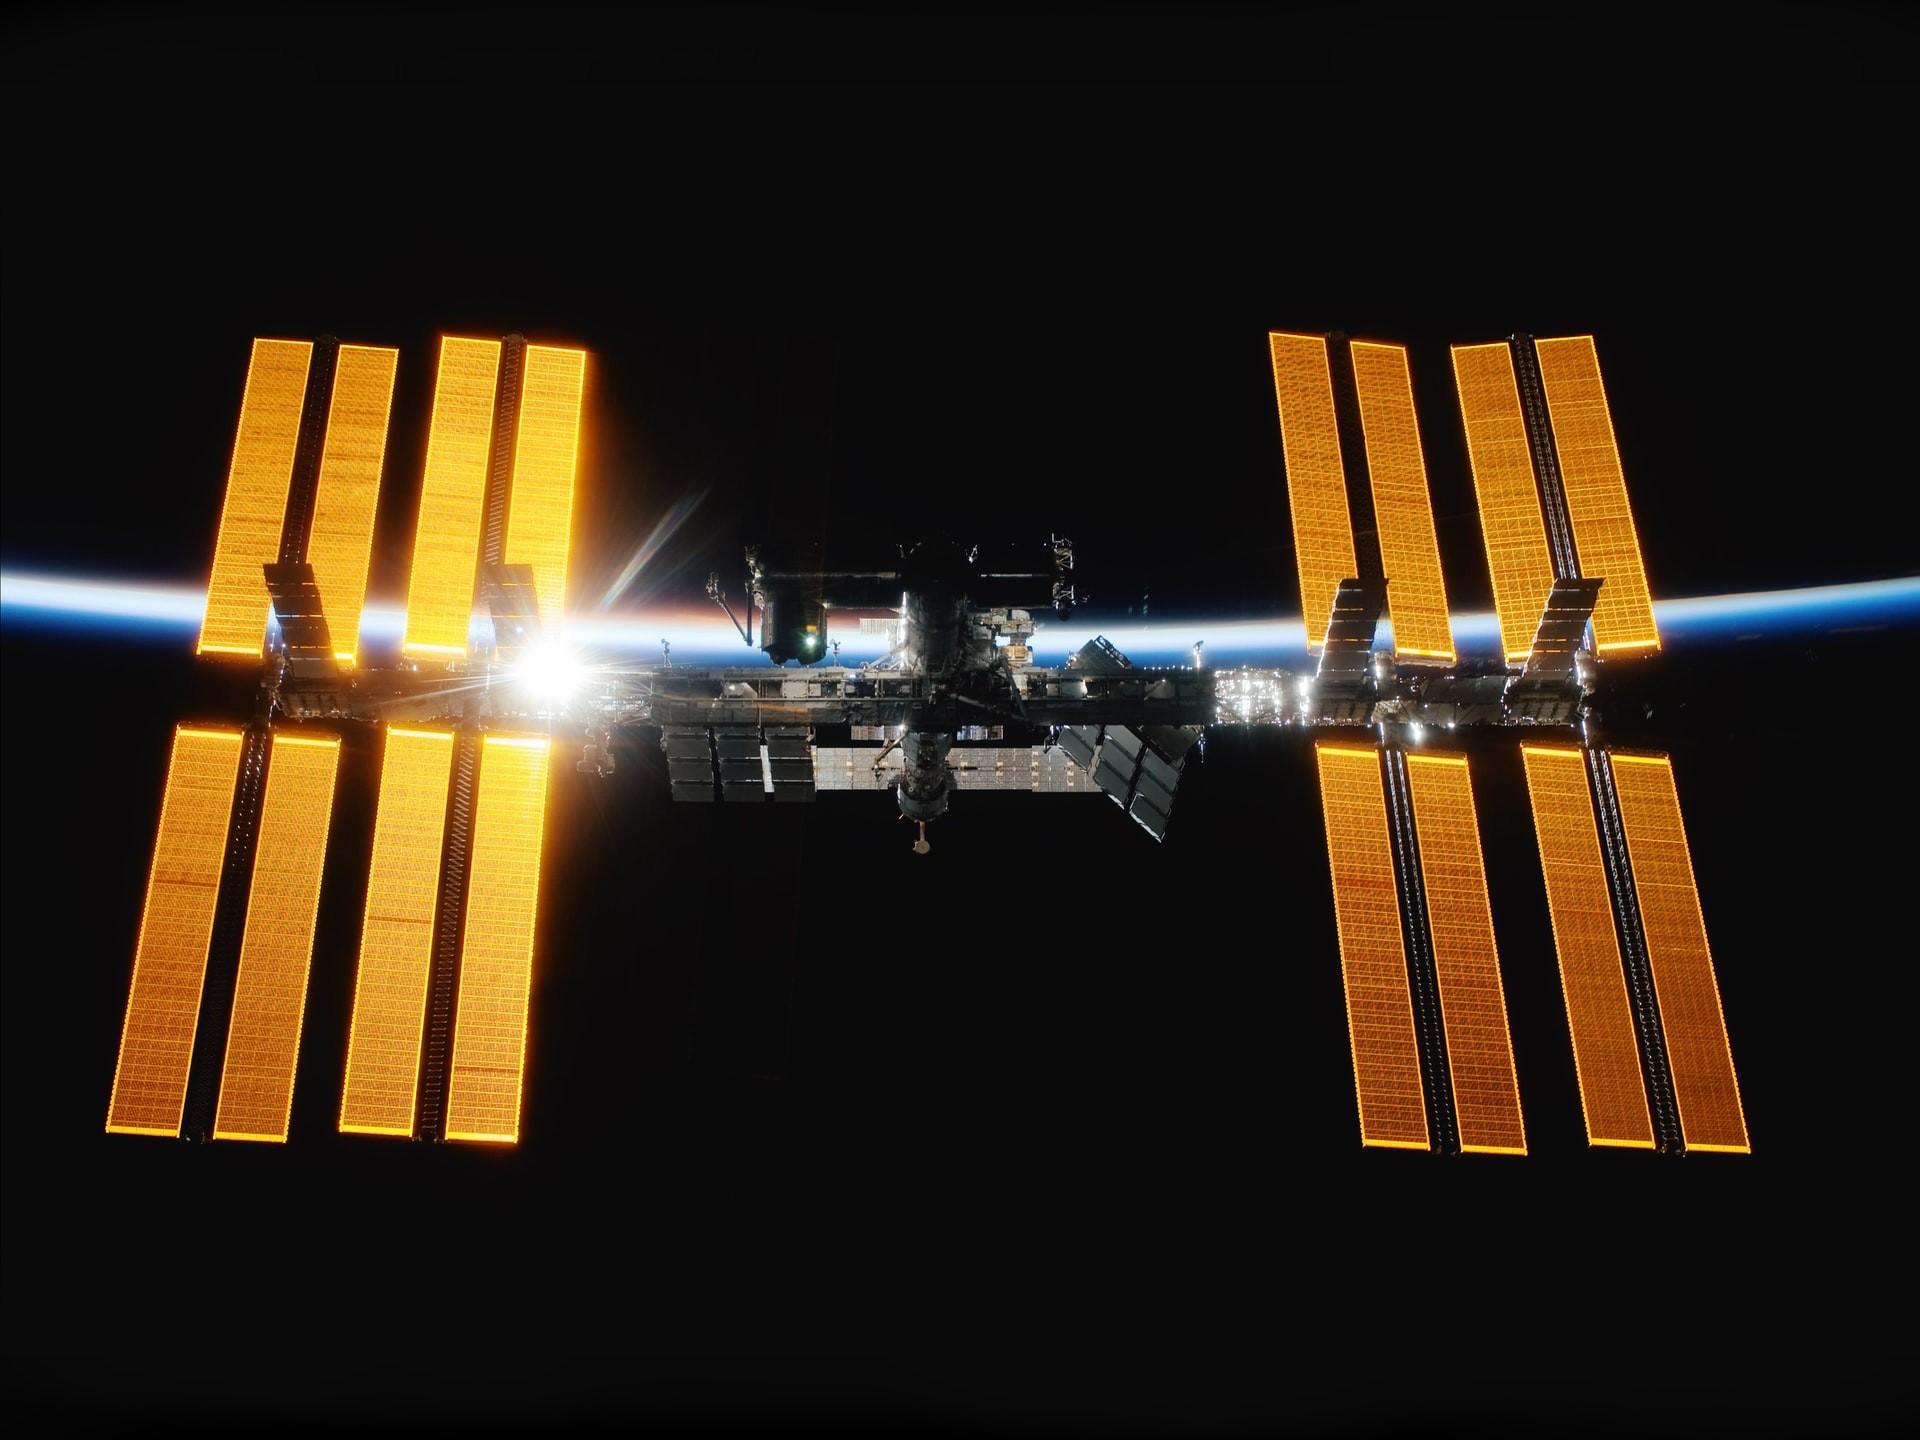 Take a virtual tour to the international space station.